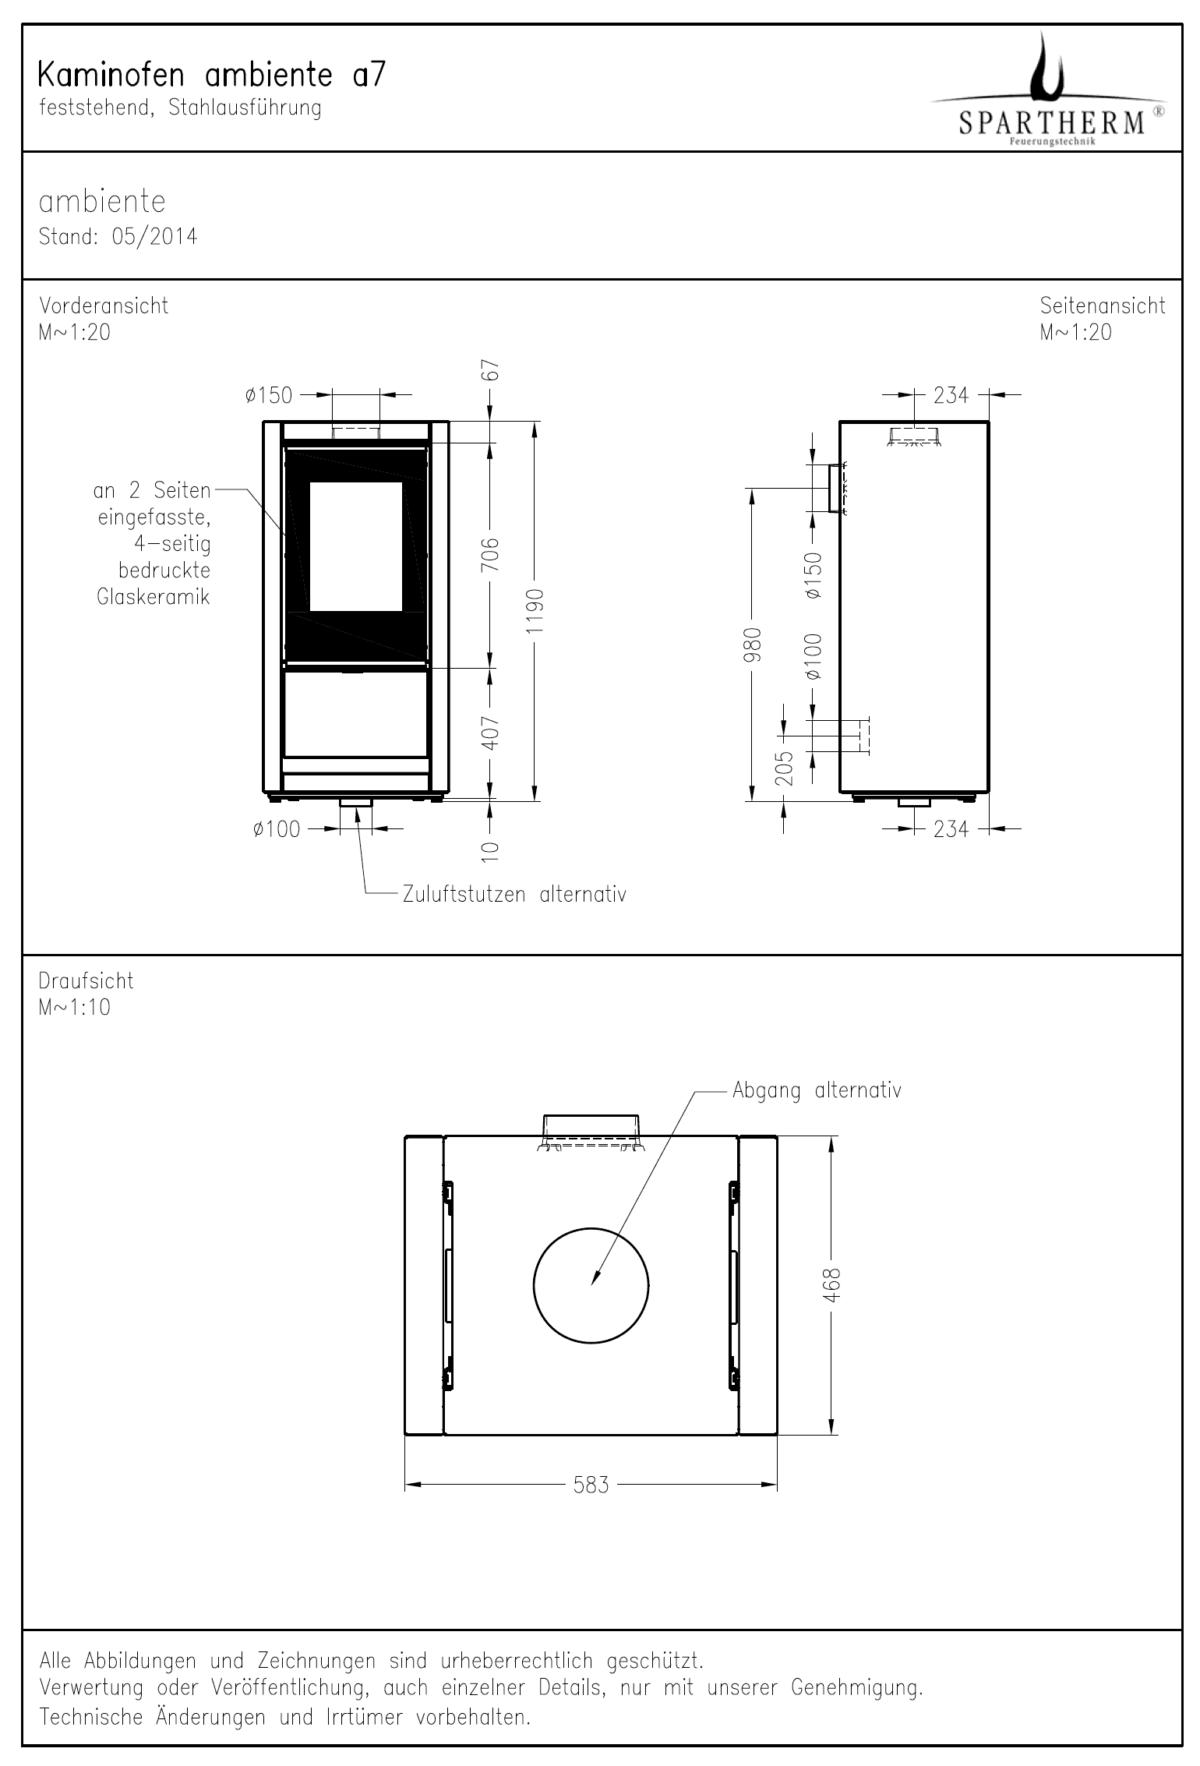 spartherm-ambiente-a7-line_image